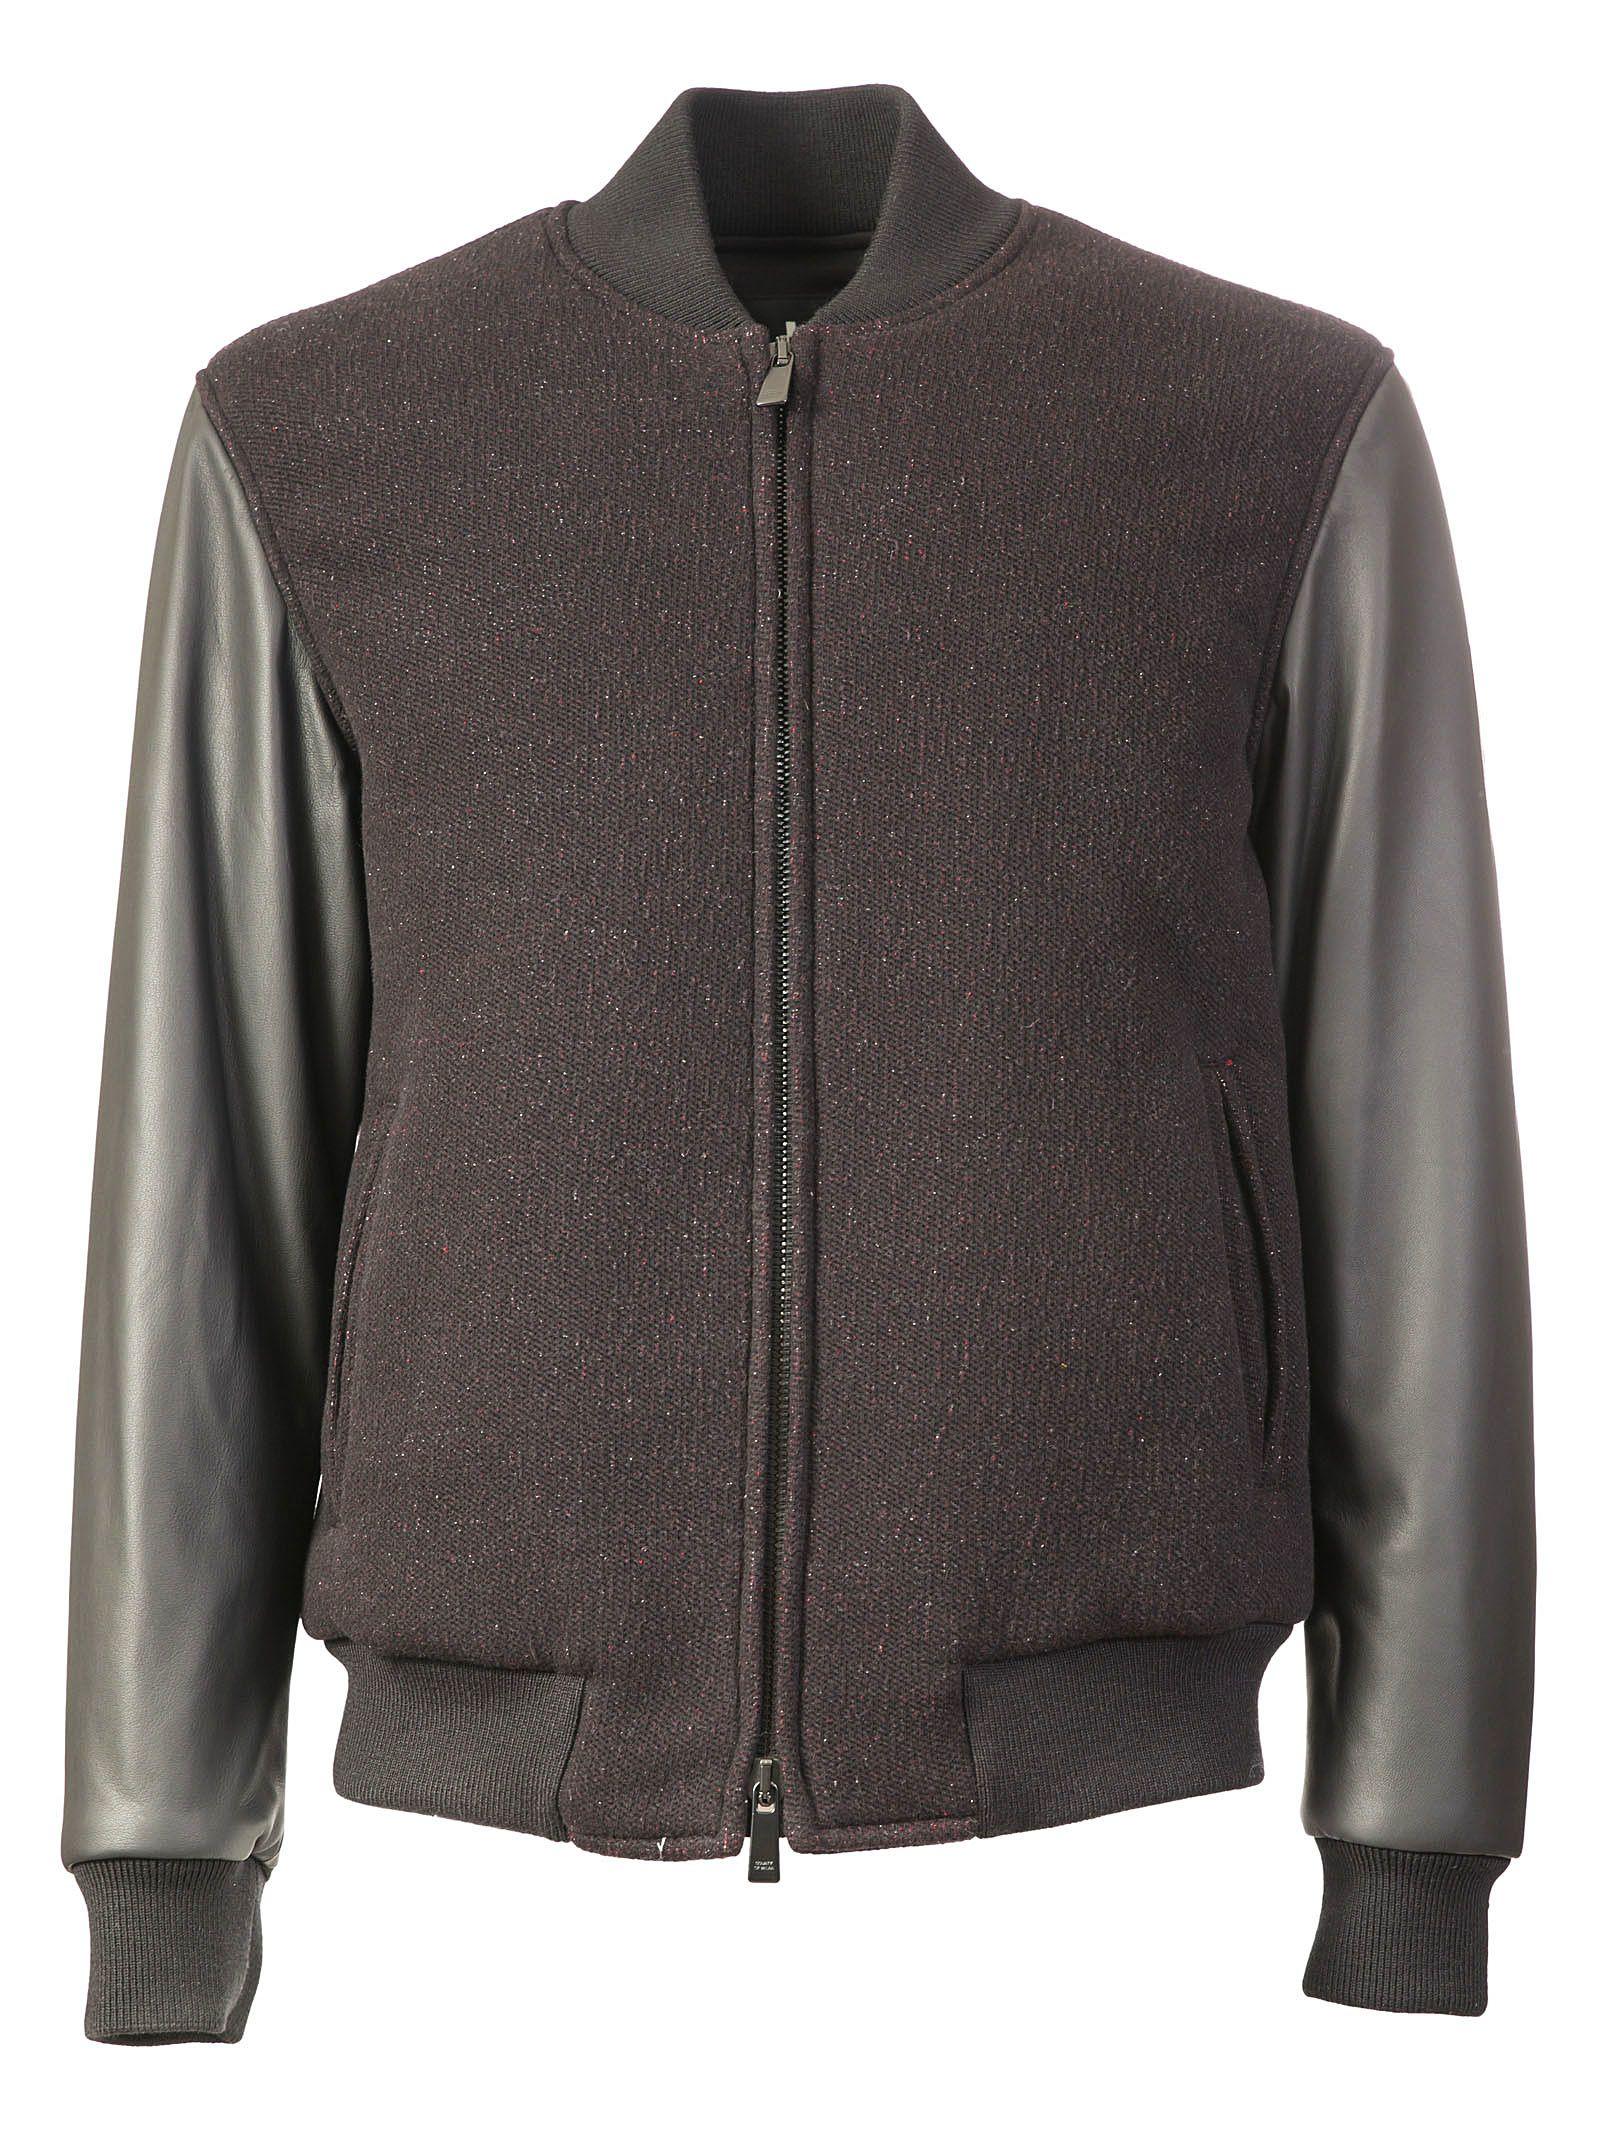 Marcelo Burlon Contrast Sleeve Varsity Jacket